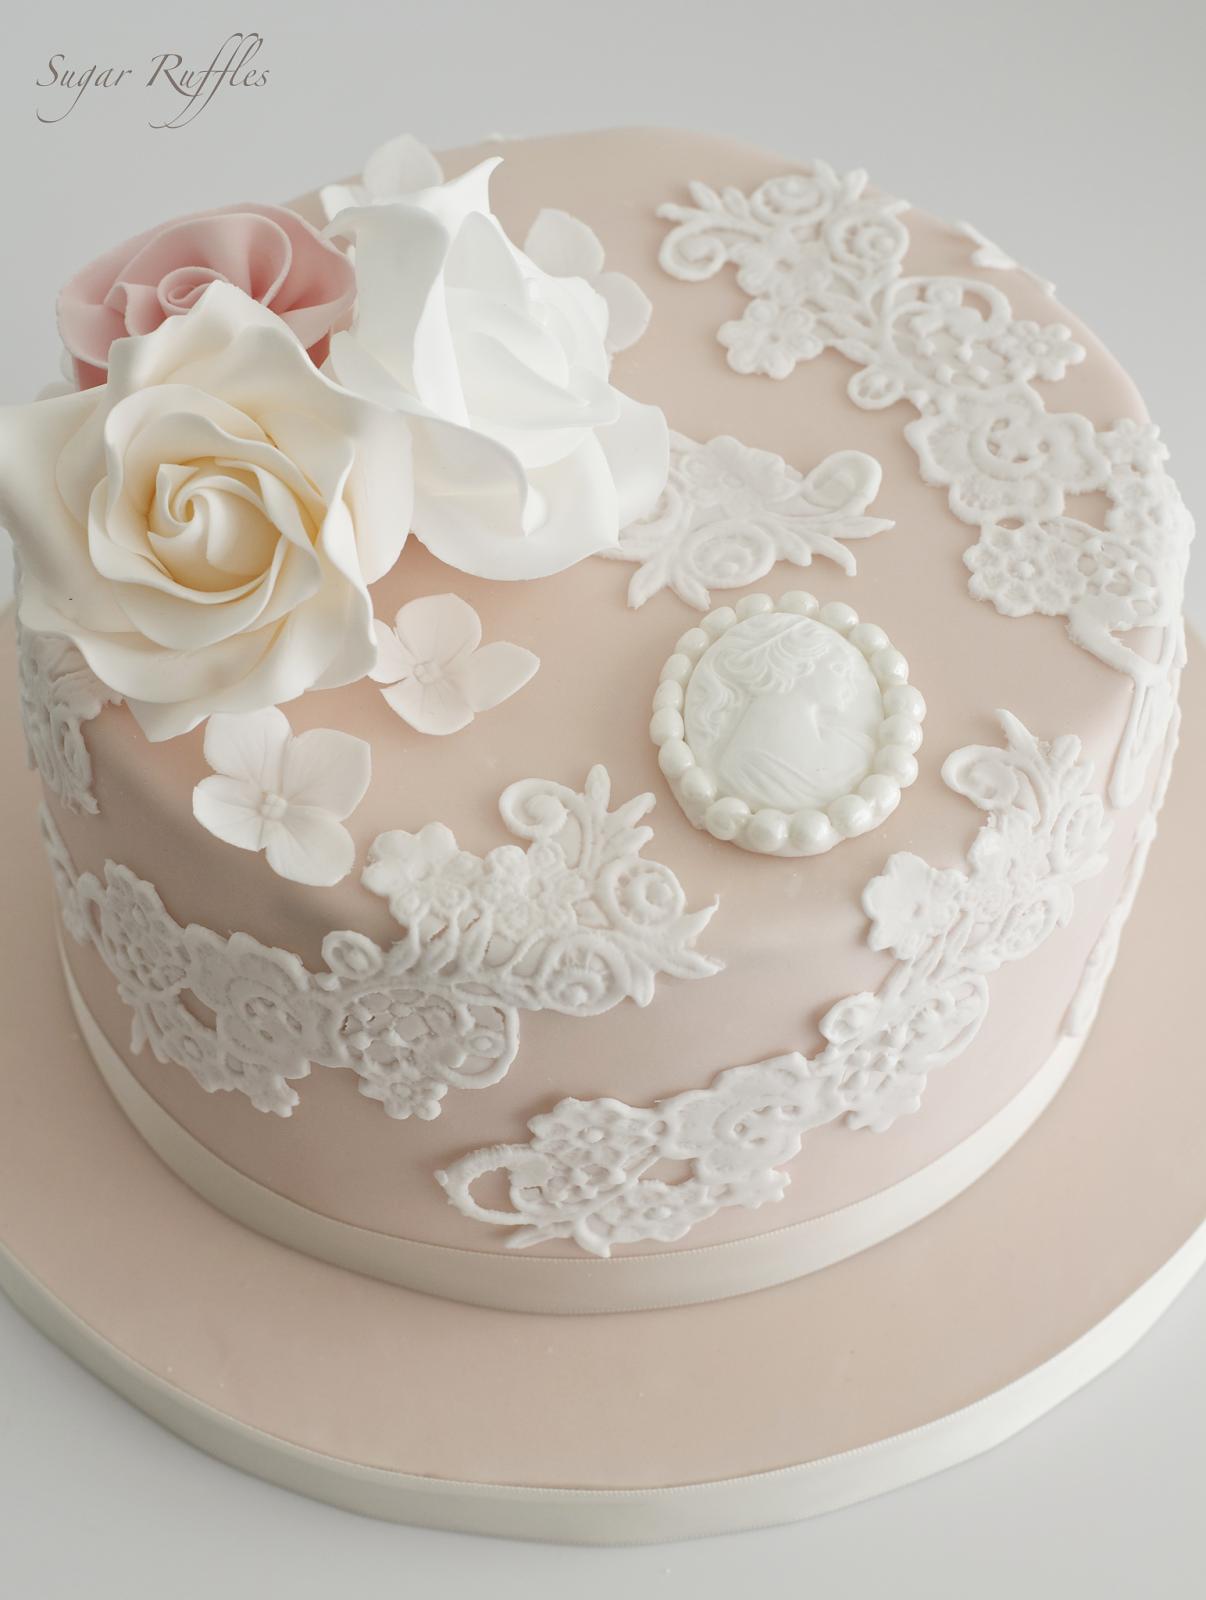 Cake Design Vintage : Sugar Ruffles, Elegant Wedding Cakes. Barrow in Furness ...